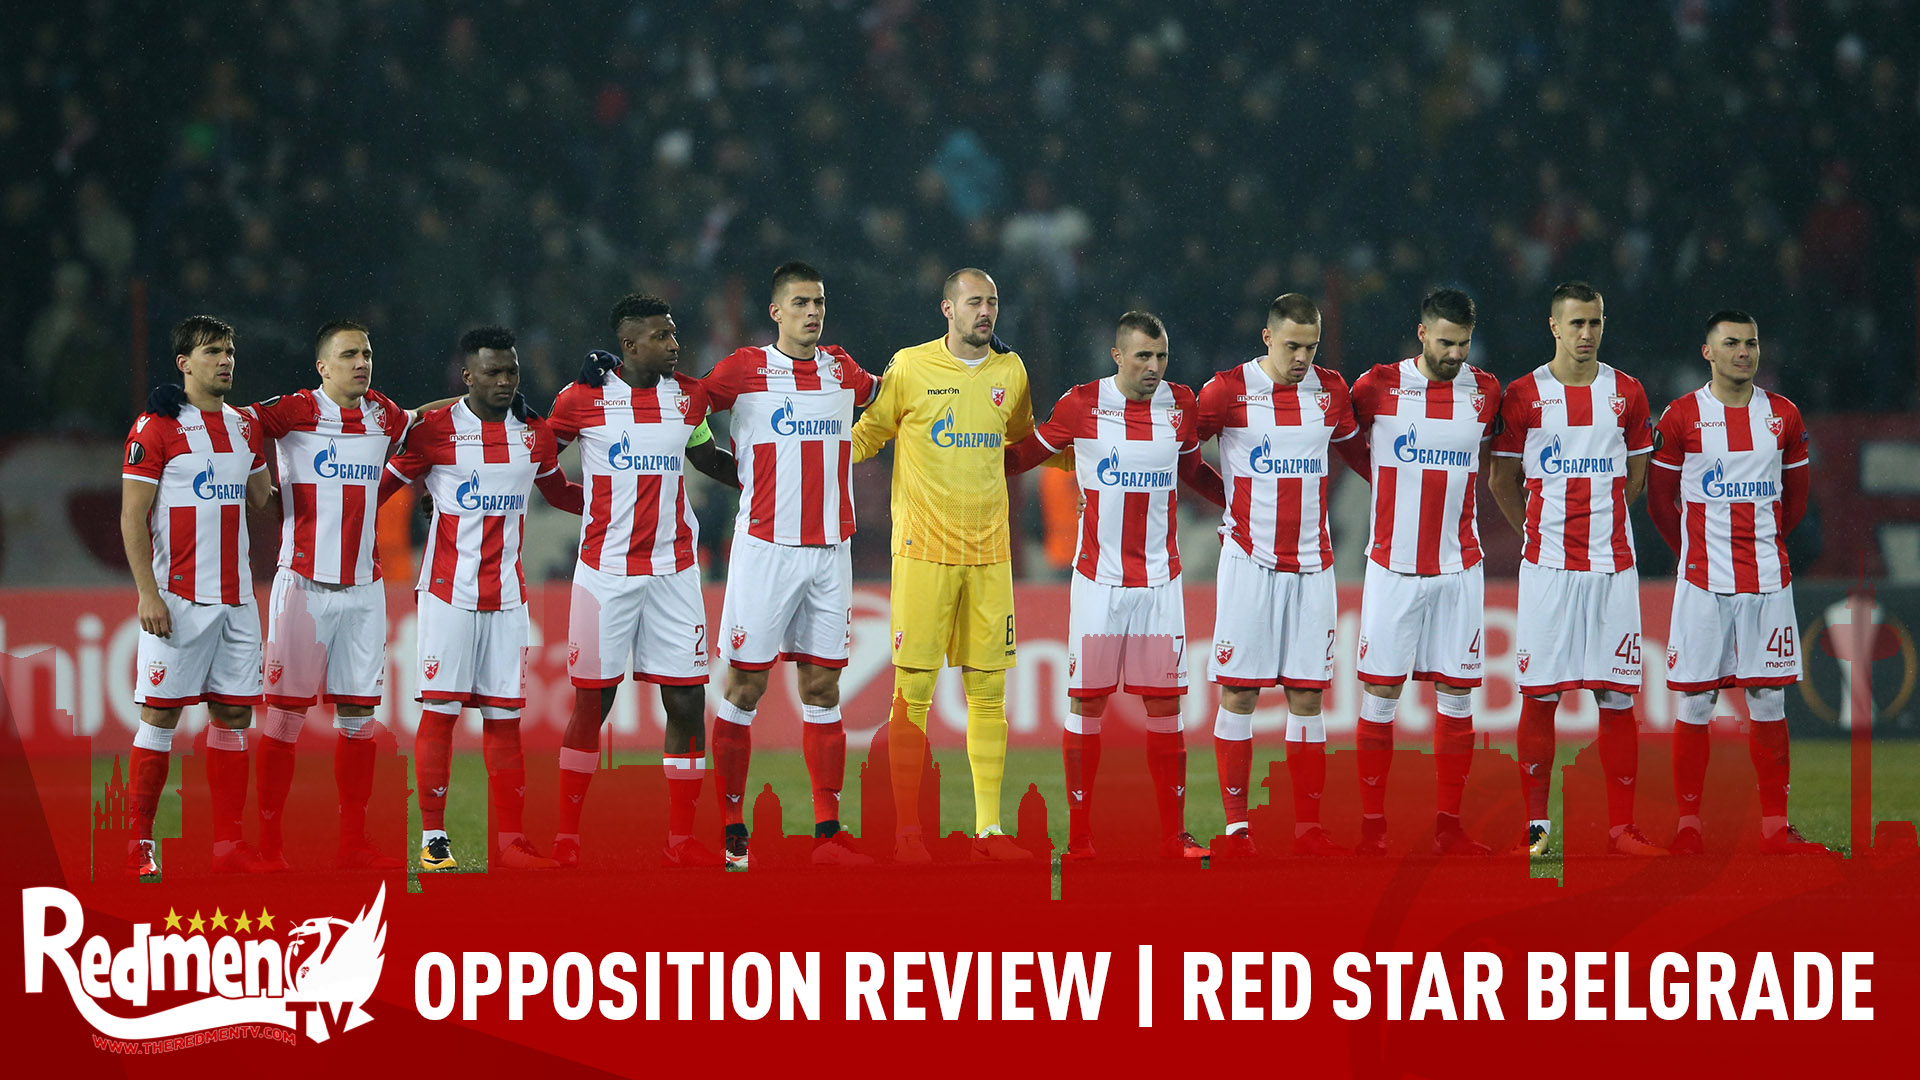 Opposition Review | Red Star Belgrade - The Redmen TV